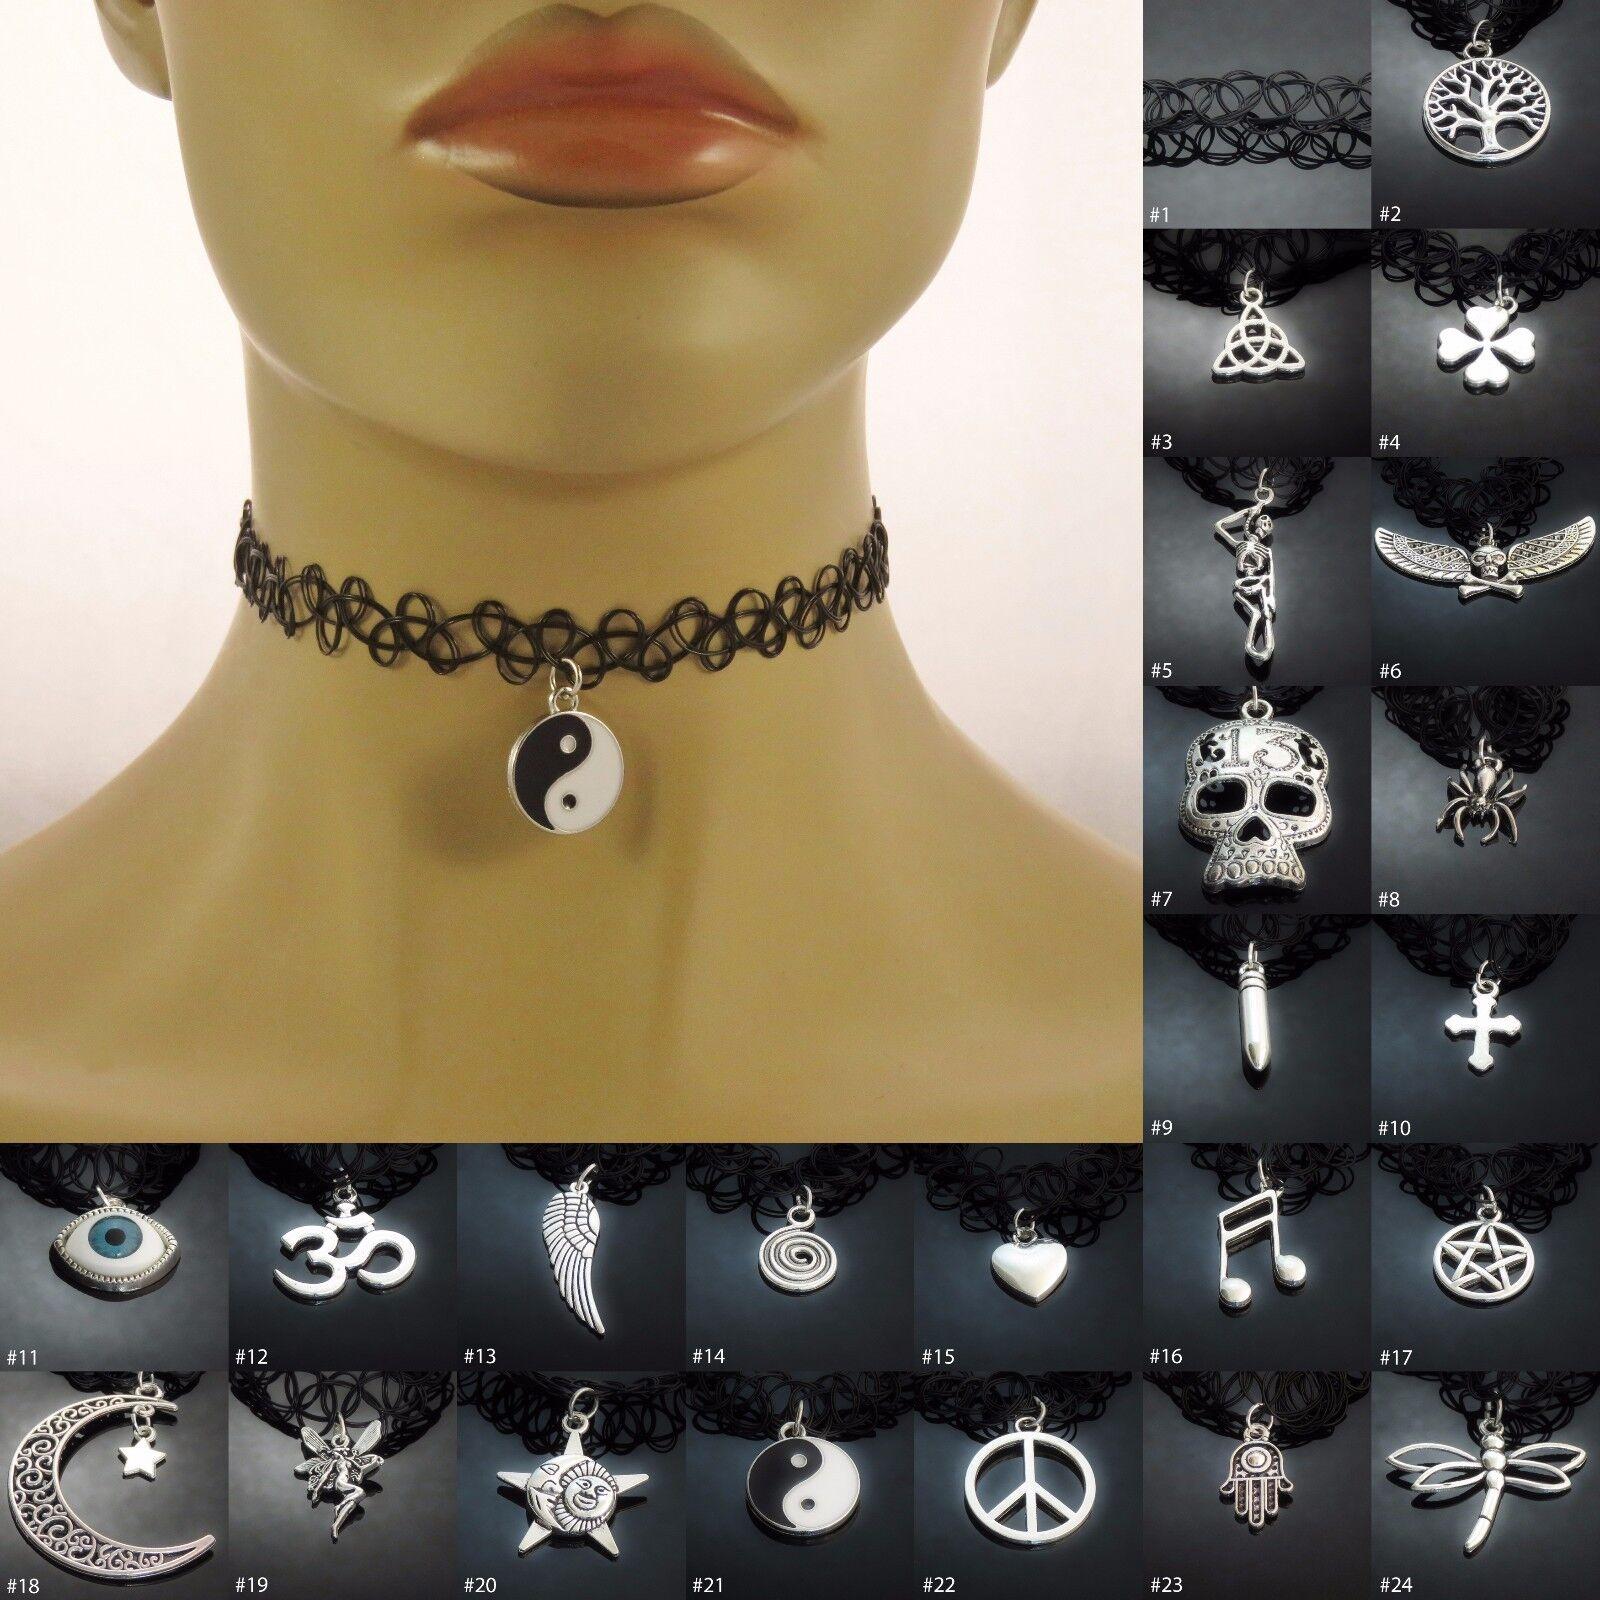 Jewellery - Tattoo Choker Stretch Necklace ladies womens girls jewellery accessory UK SELLER